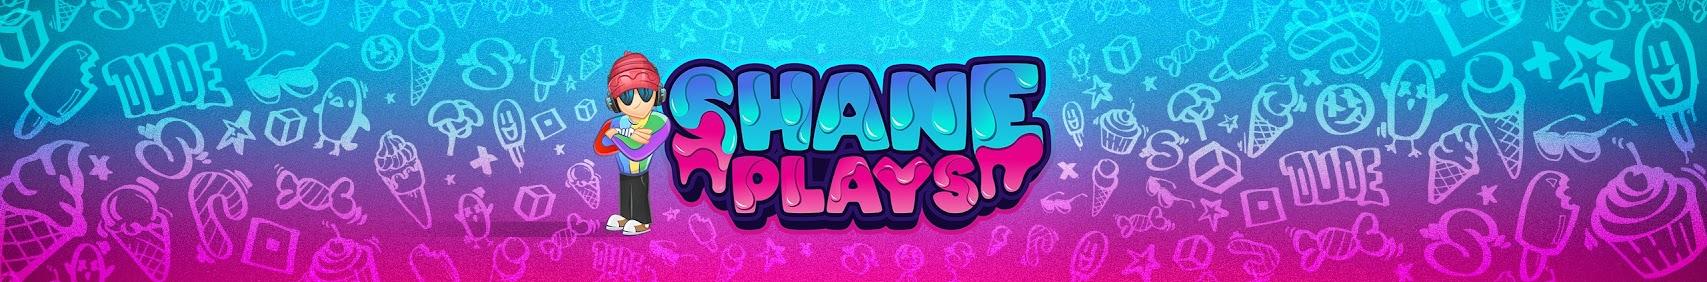 ShanePlays